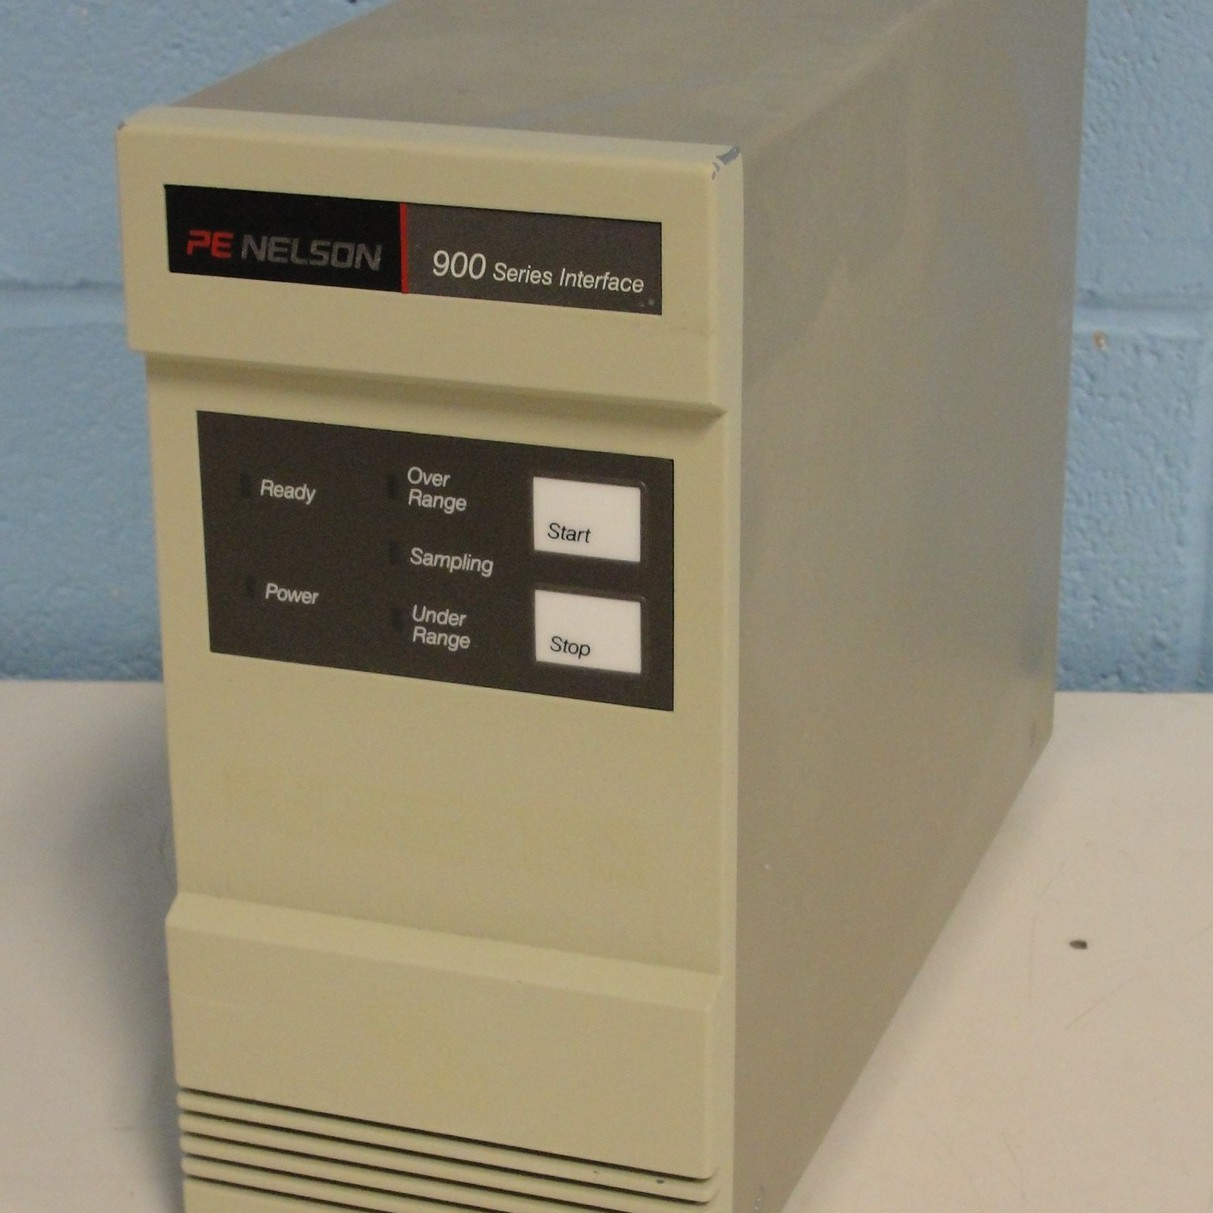 Perkin Elmer PE Nelson 900 Series Interface Image